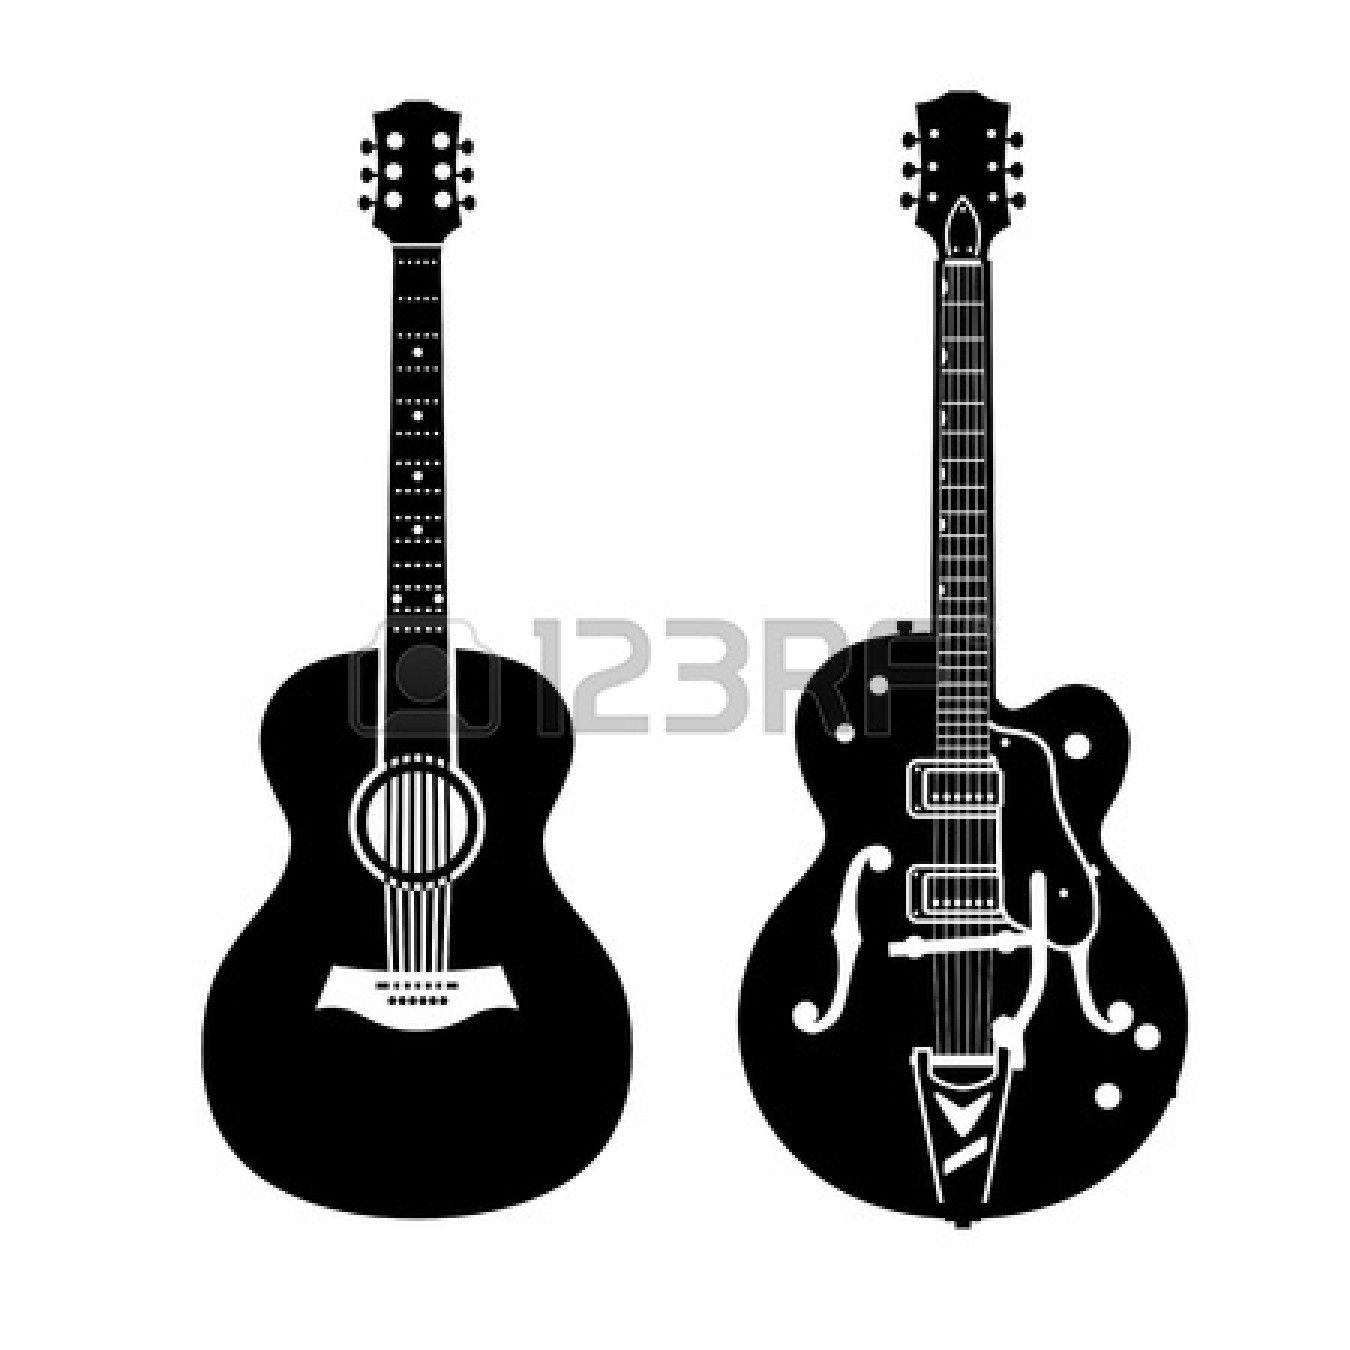 Acoustic Guitar And Electric Guitar Guitar Acoustic Guitar Electric Guitar